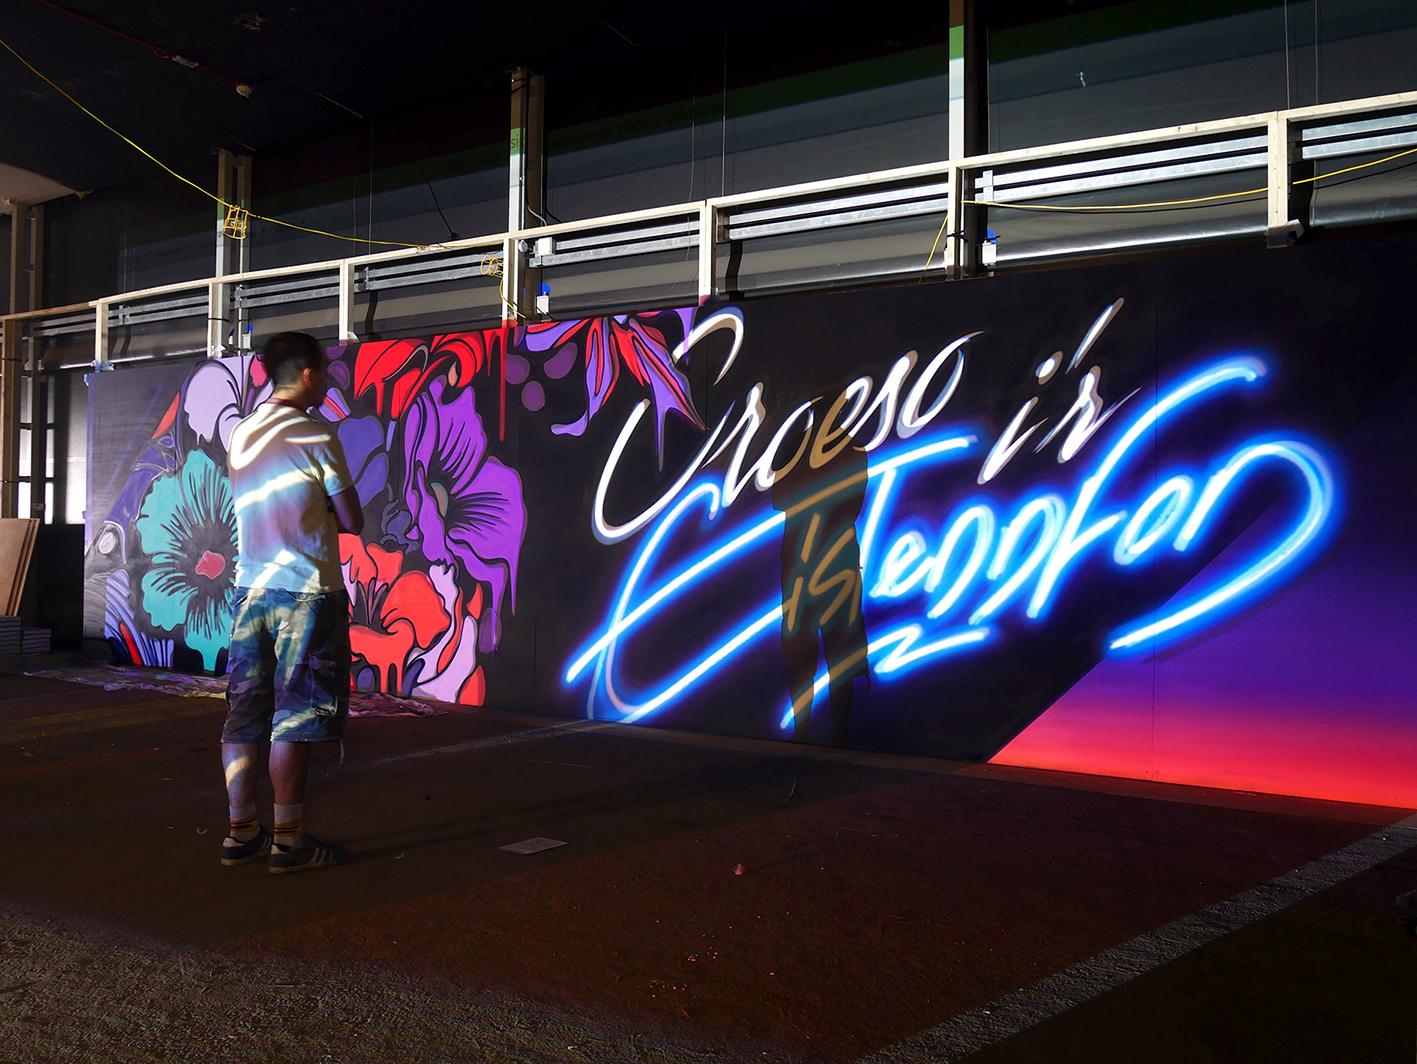 Nerone-street-art-Cardif-neone 2